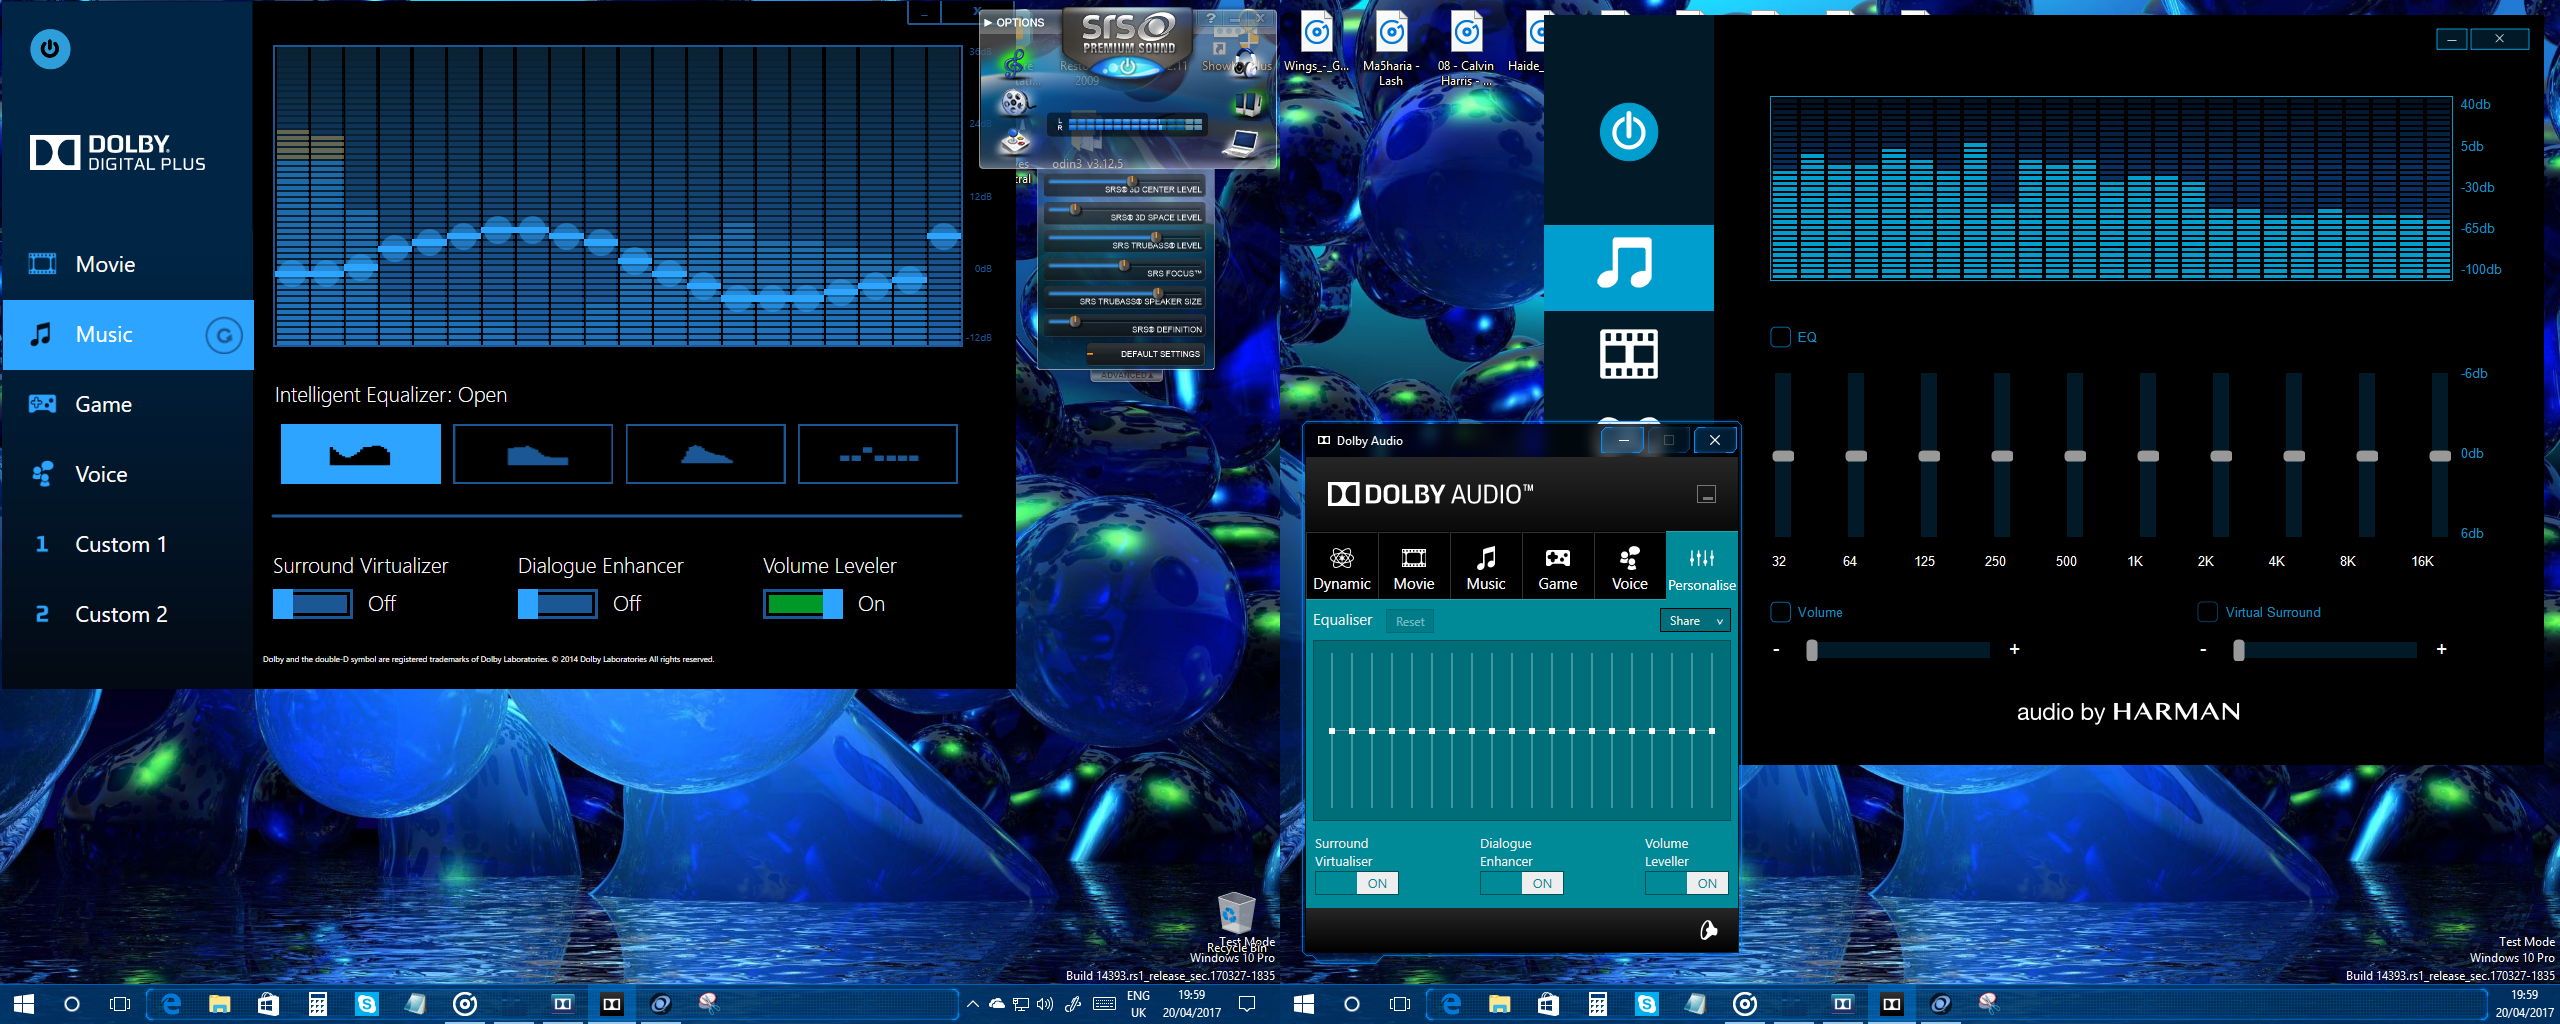 Dolby audio driver 7 2 7000 download | ЕНТ, ПГК, гранты, стипендии